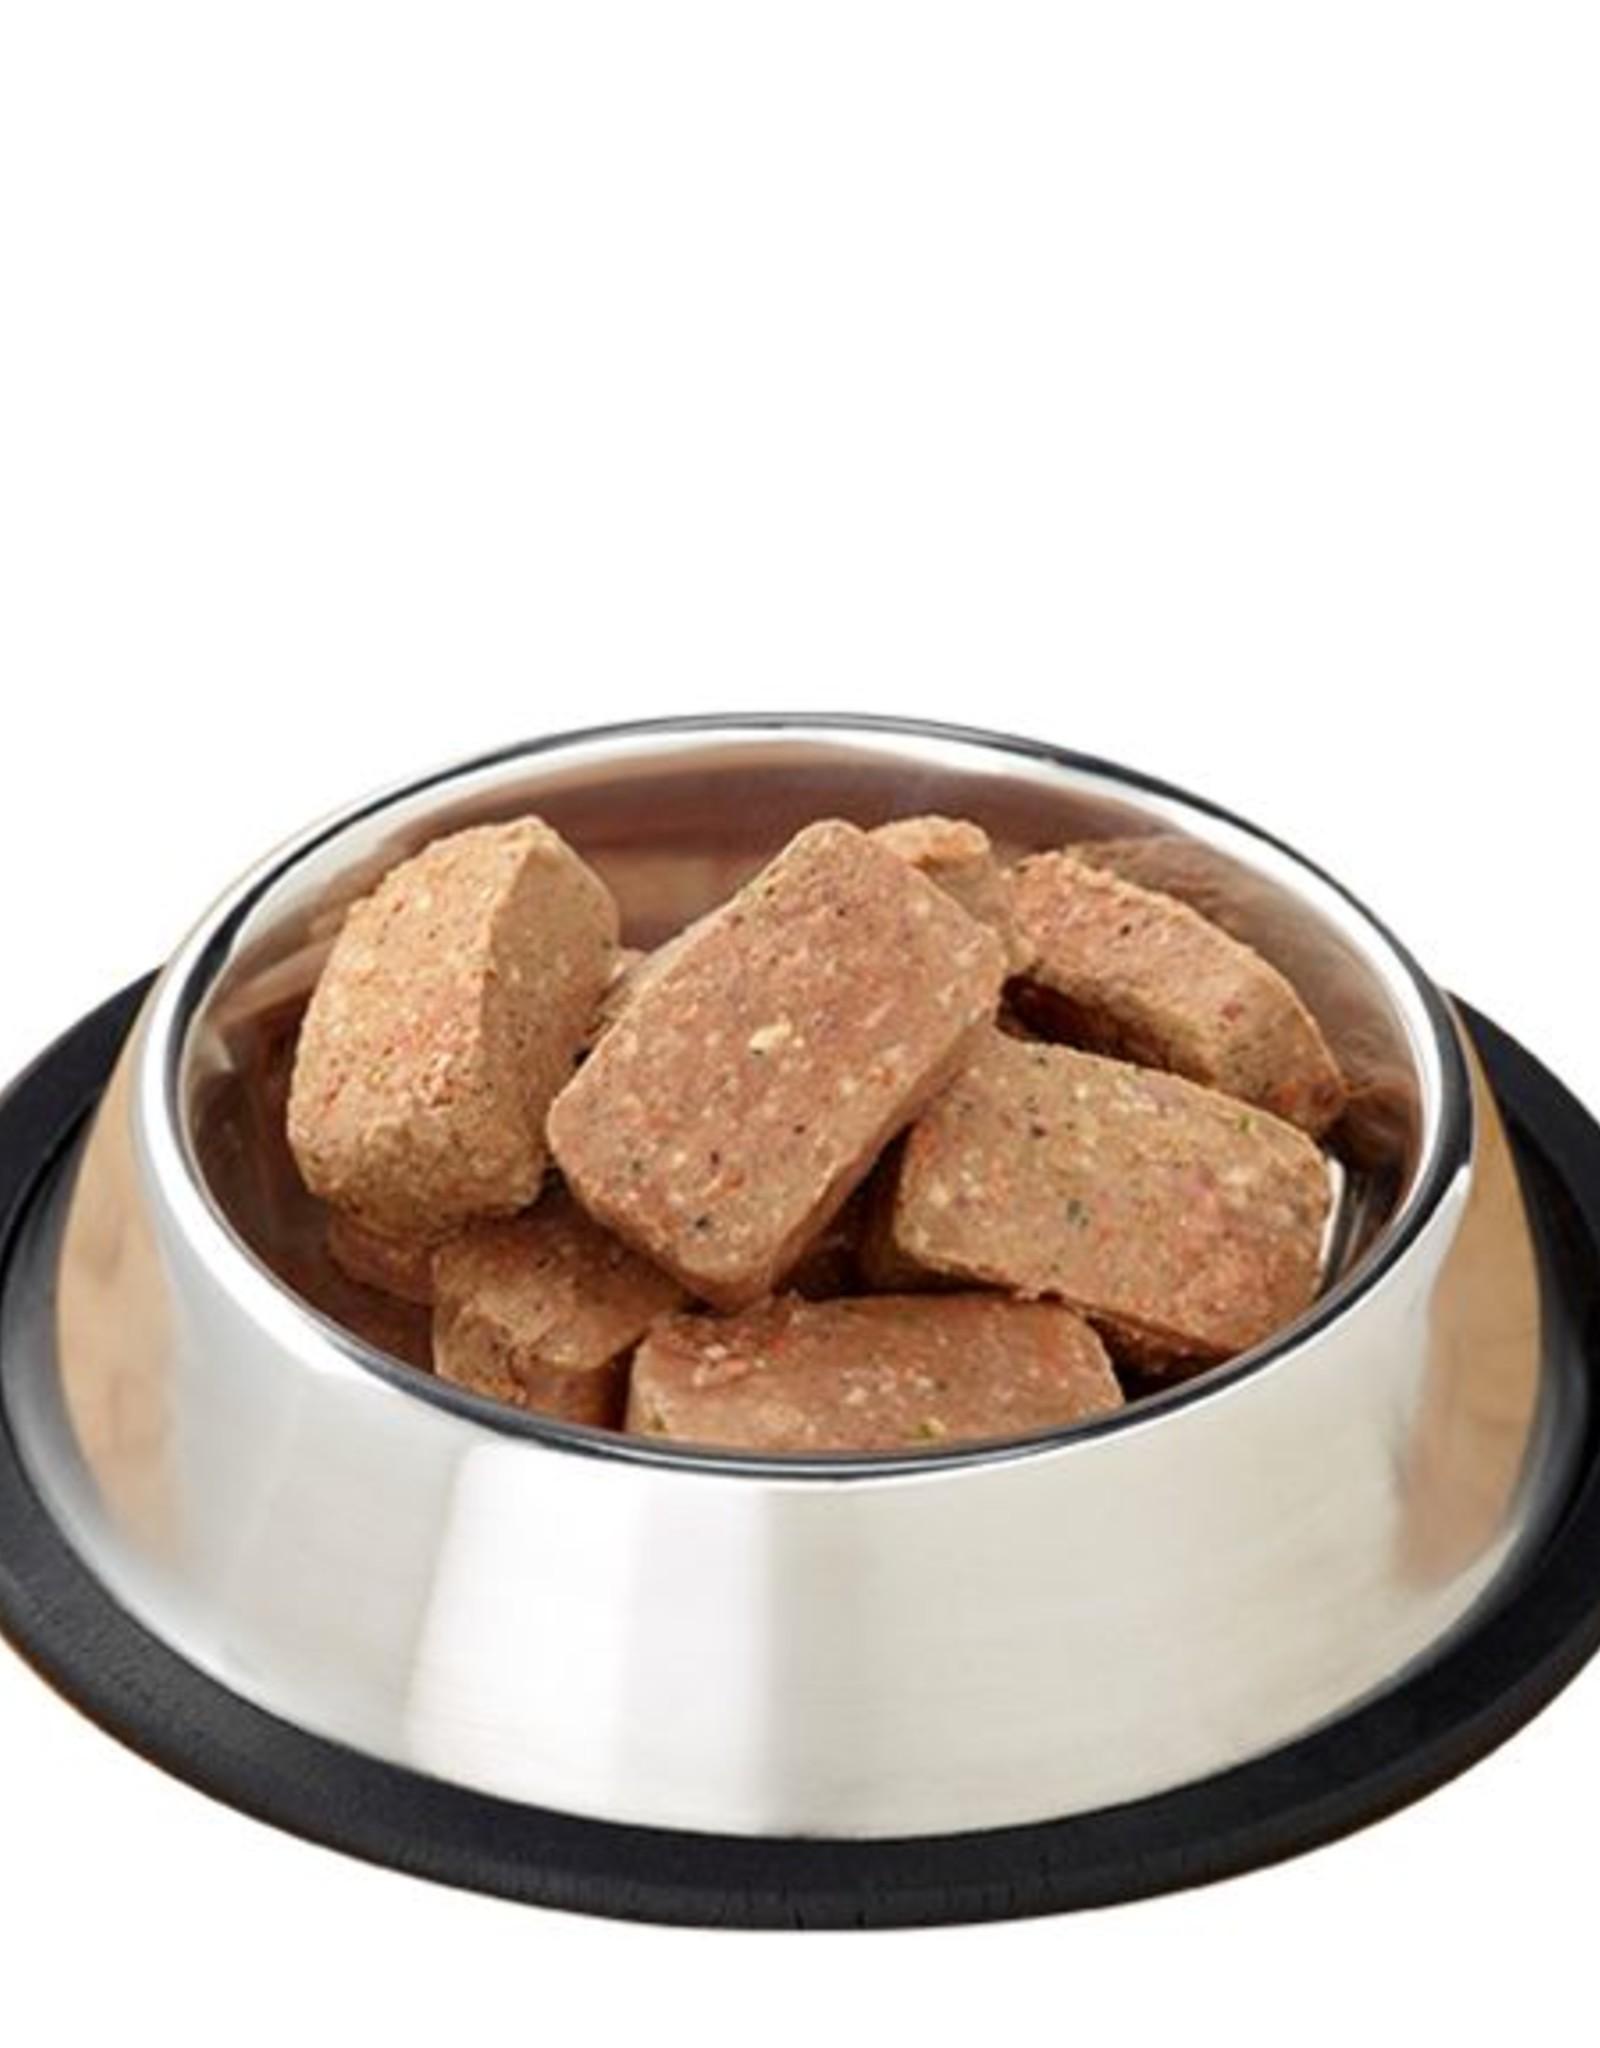 Primal Pet Food Primal Canine Raw Frozen Beef